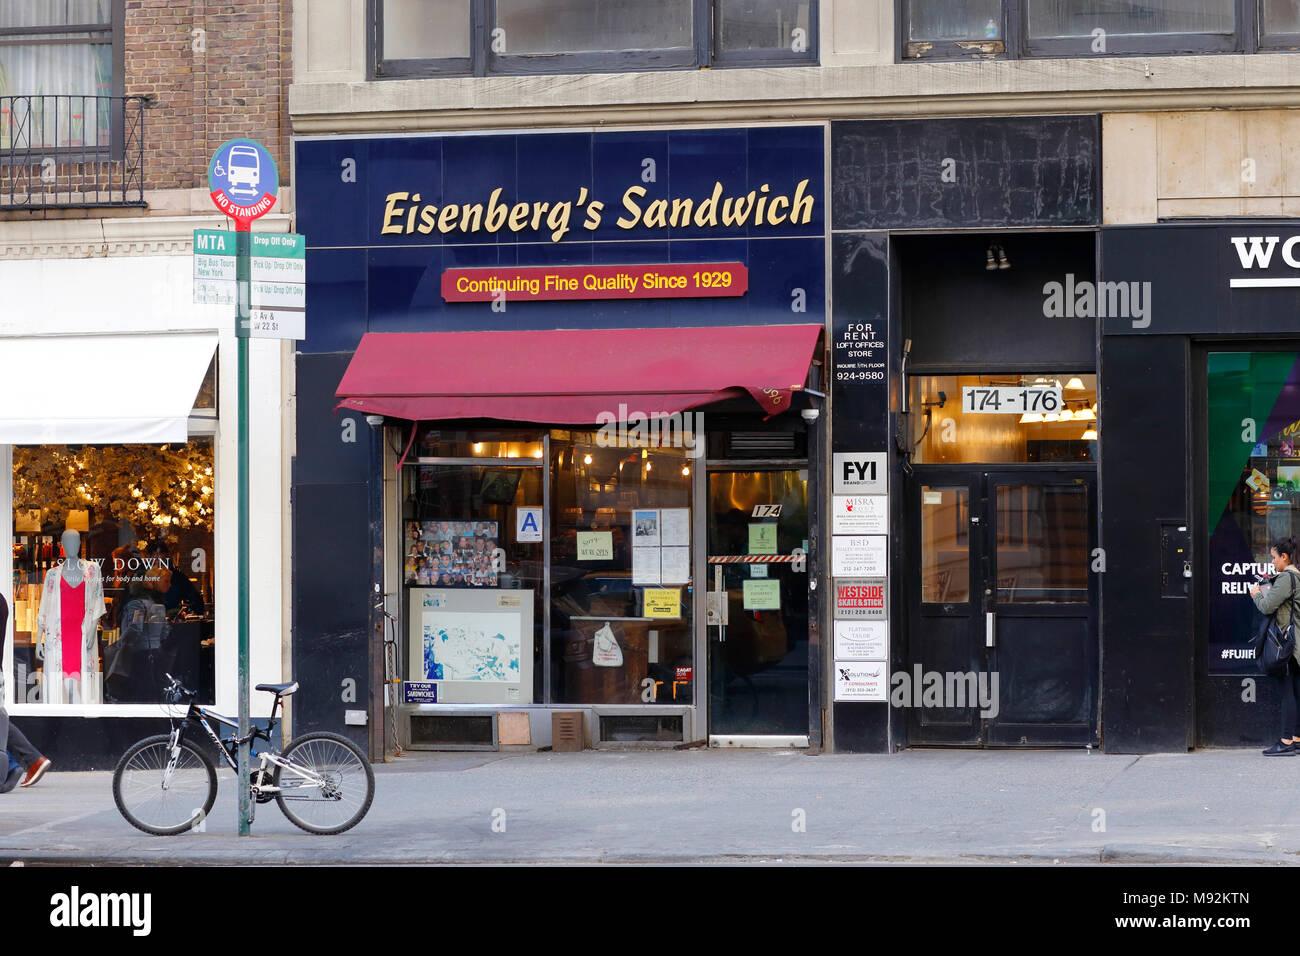 Das Eisenberg Sandwich Shop, 174 5th Ave, New York, NY